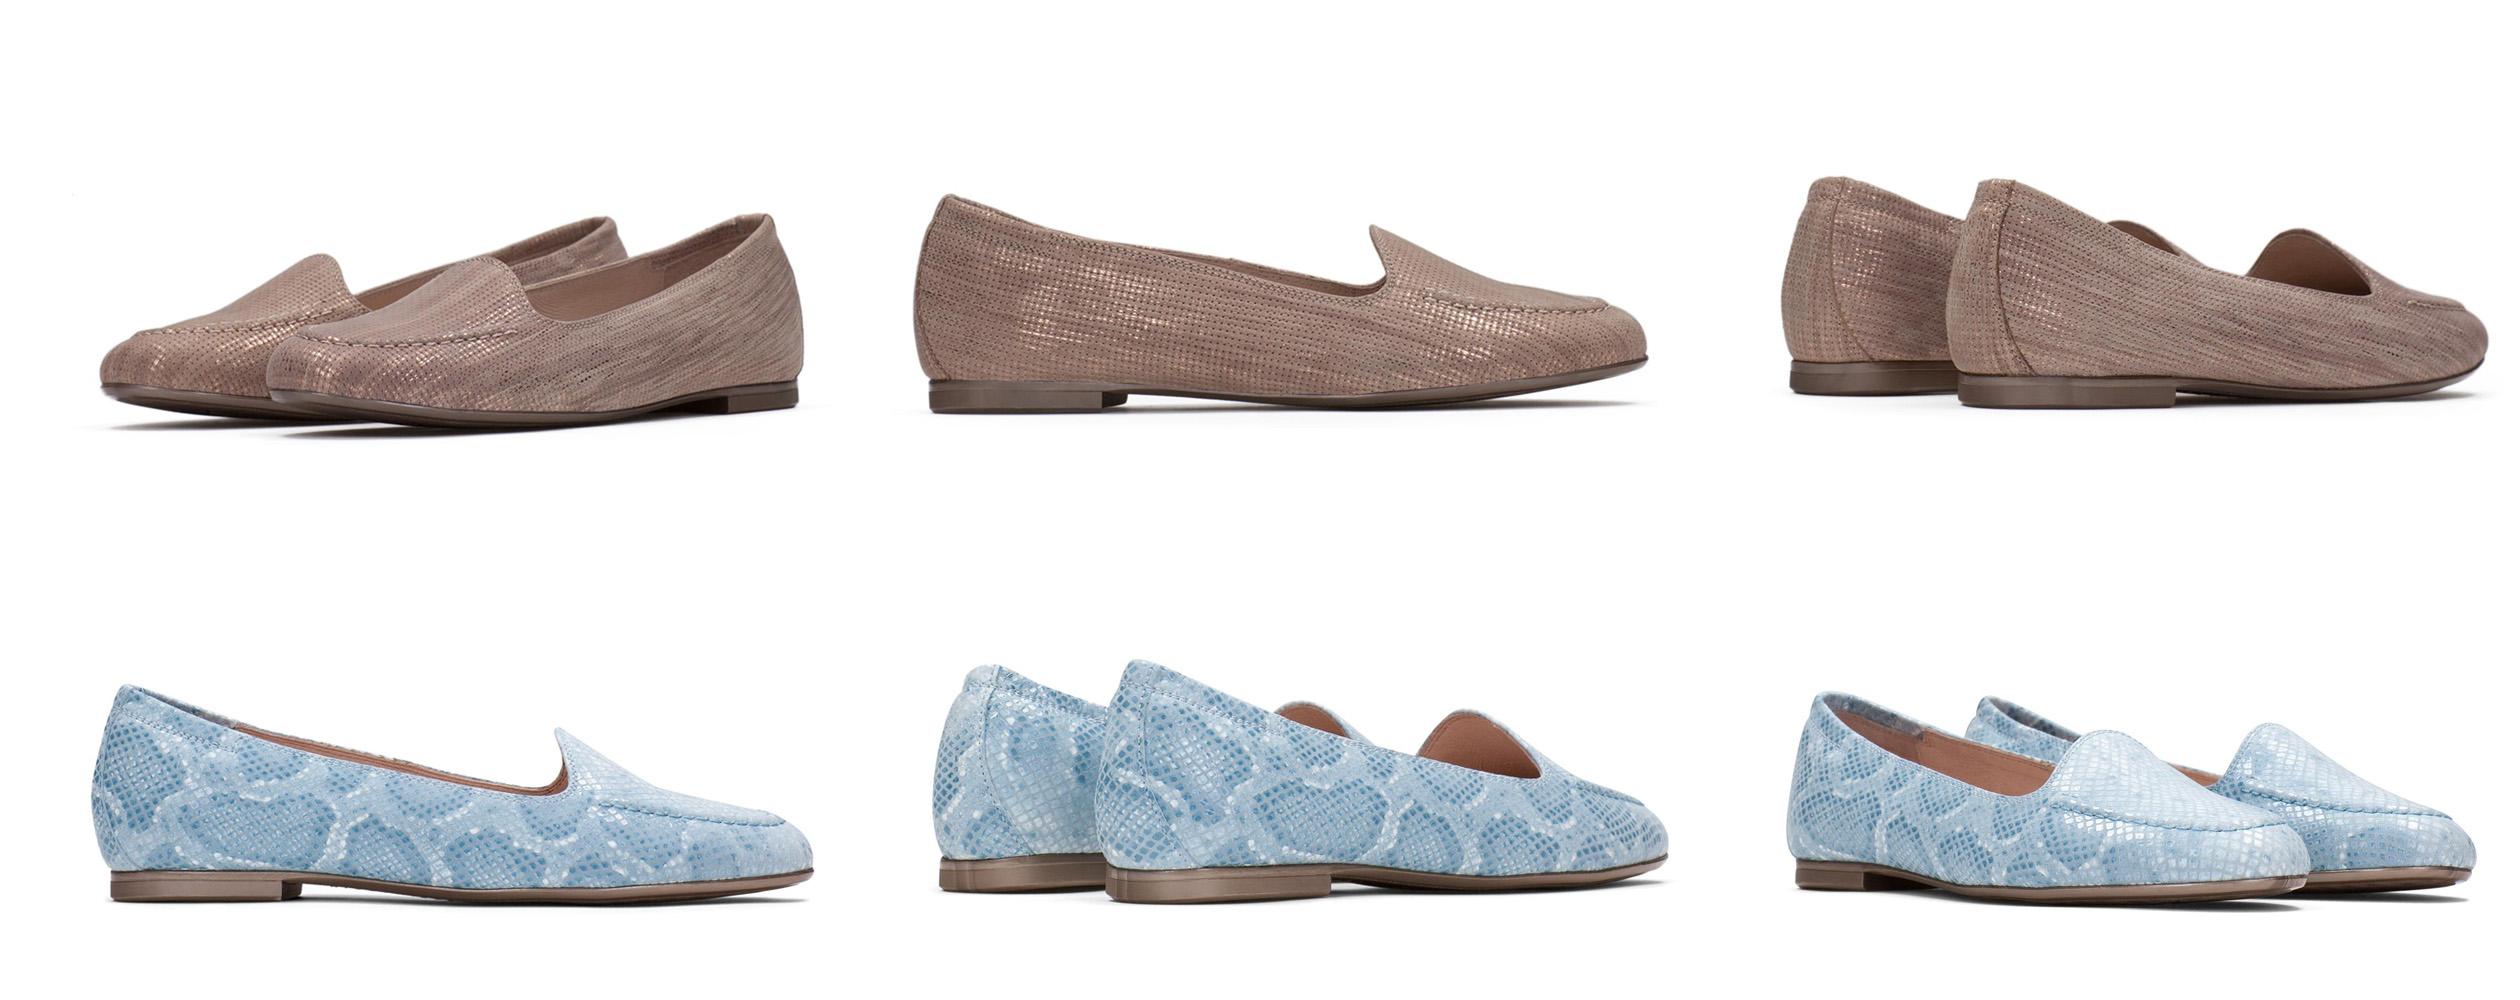 a6ca46cb1f6 zapatos bailarinas de hispanitas